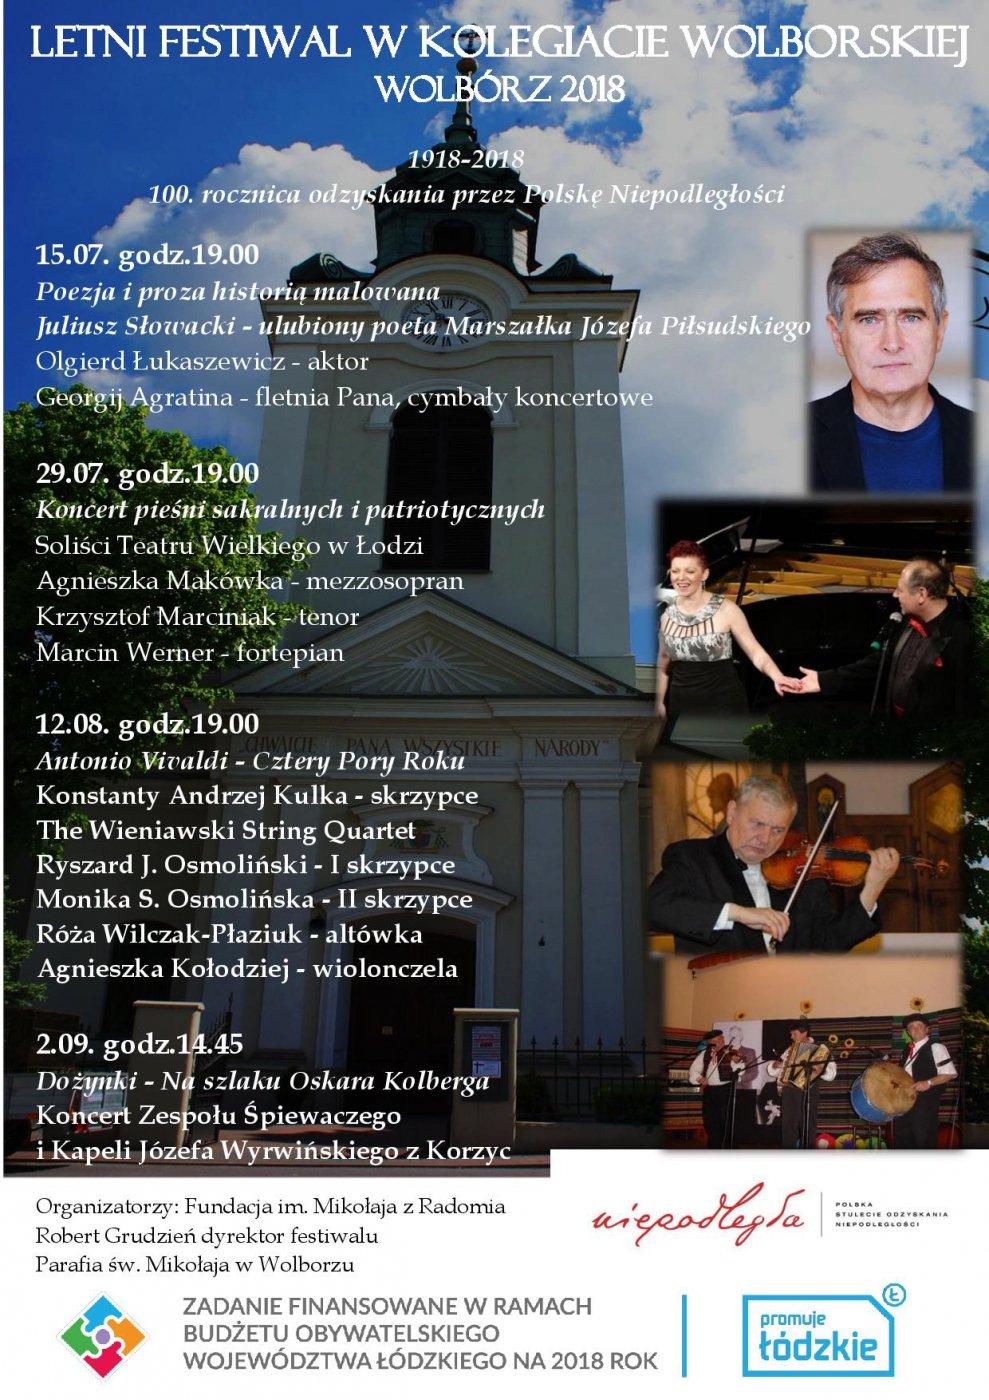 Letni Festiwal w Kolegiacie Wolborskiej